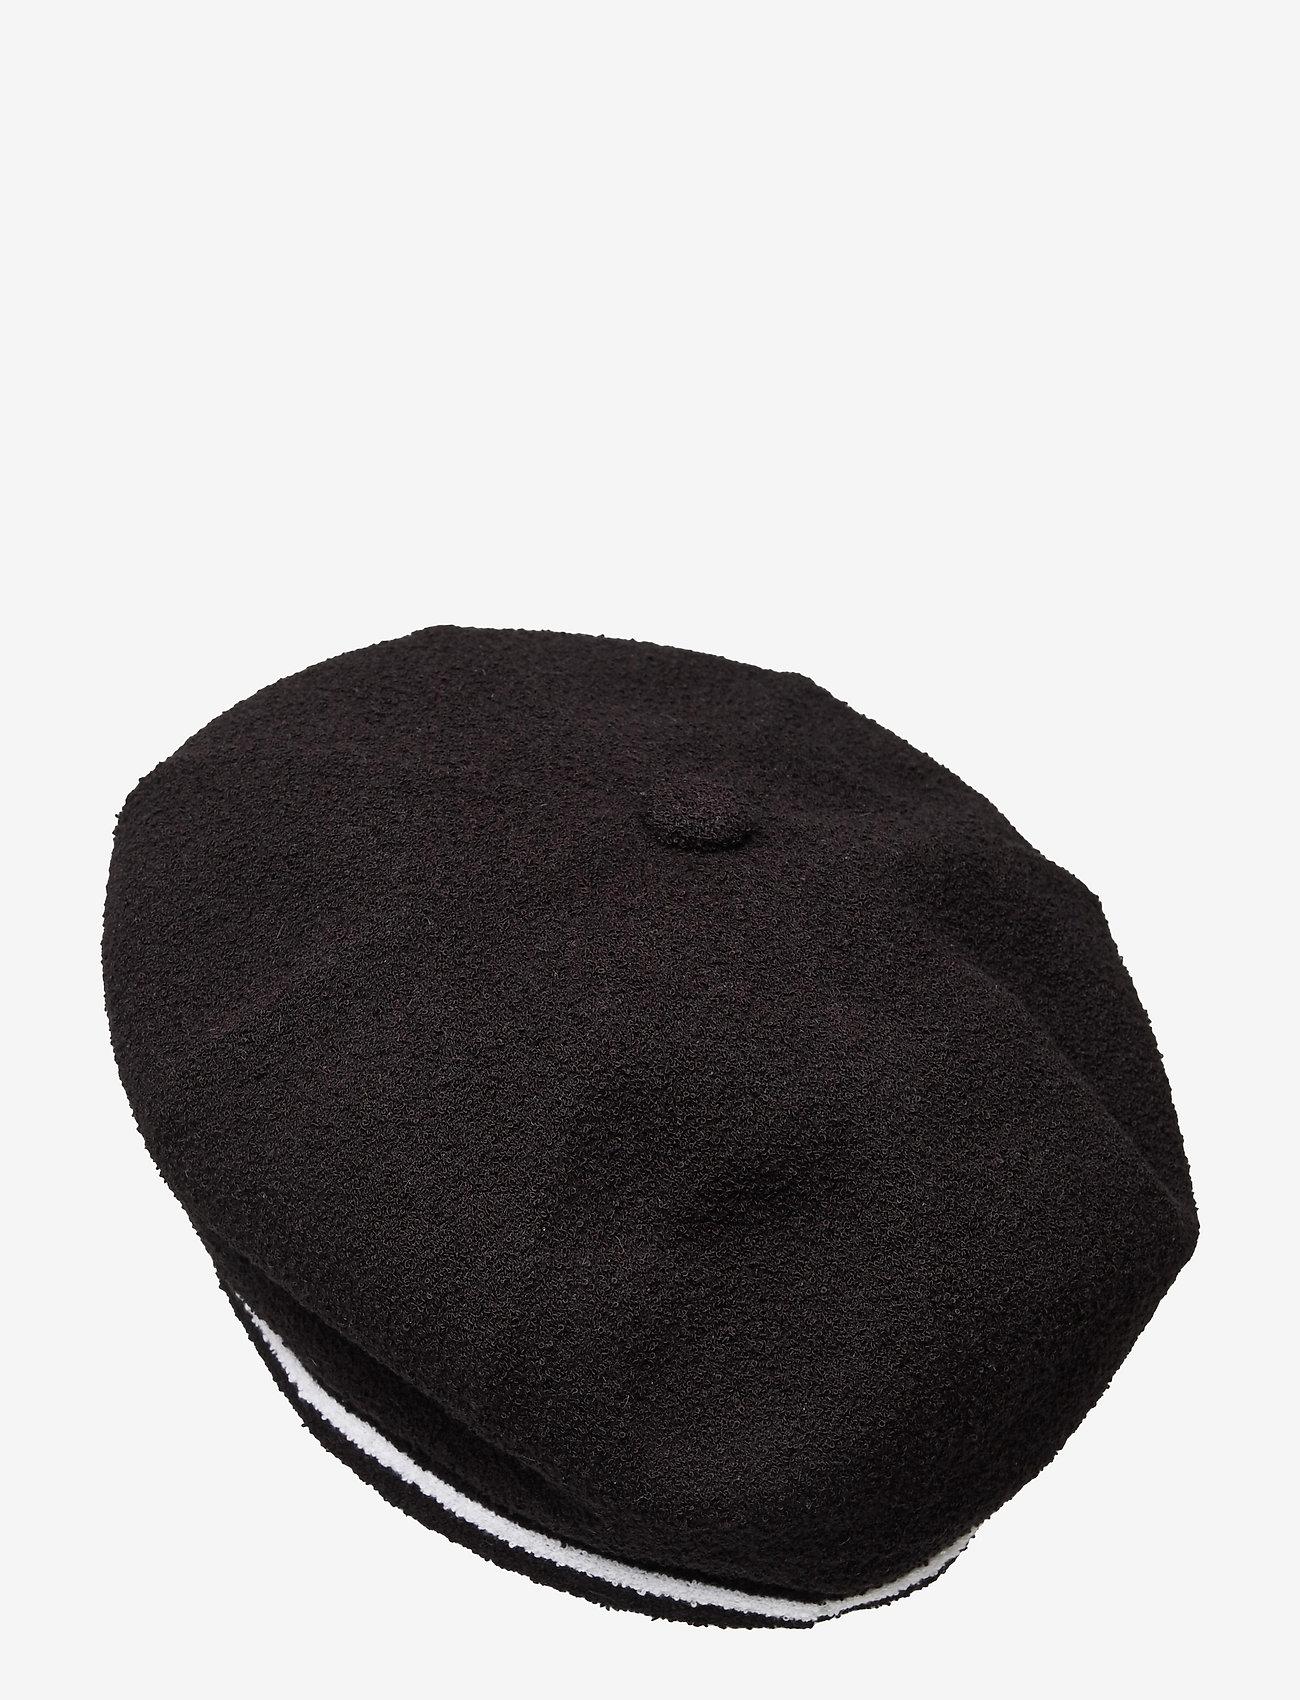 Kangol - KG 2-TONE BERMUDA JAX BERET - chapeaux - black - 1